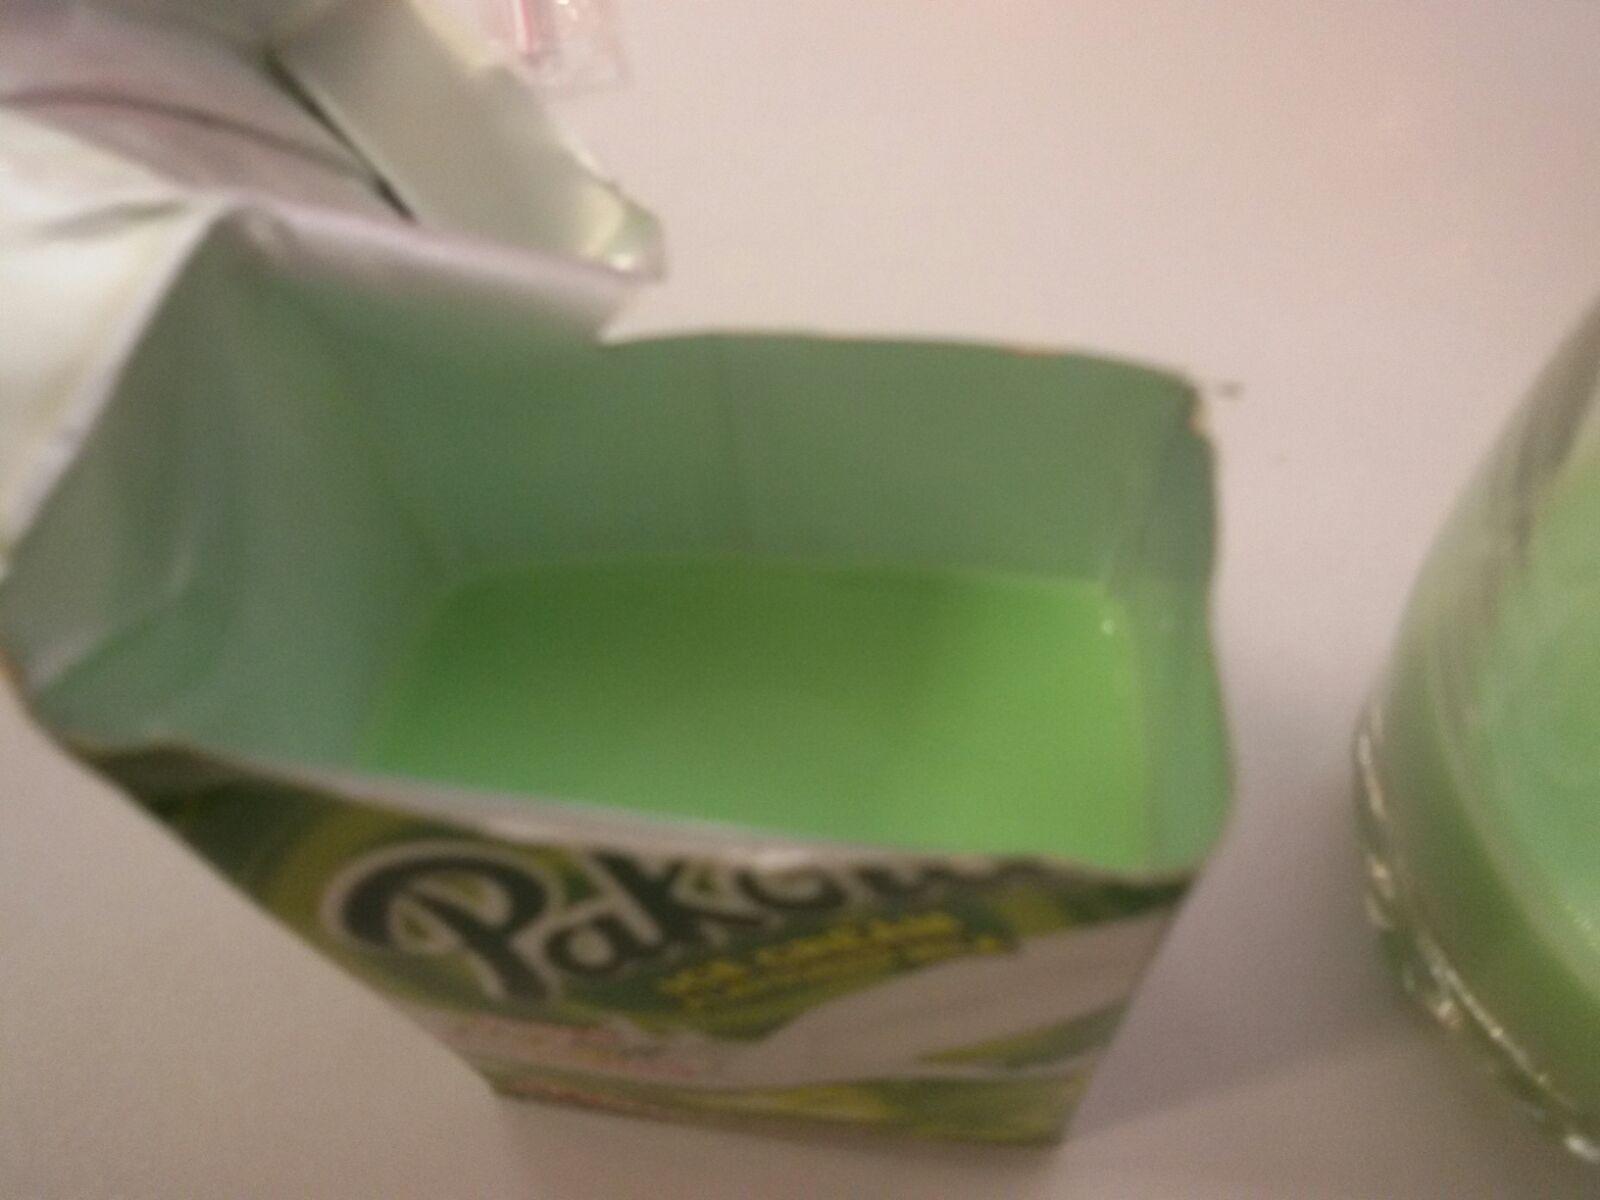 Pakola milk